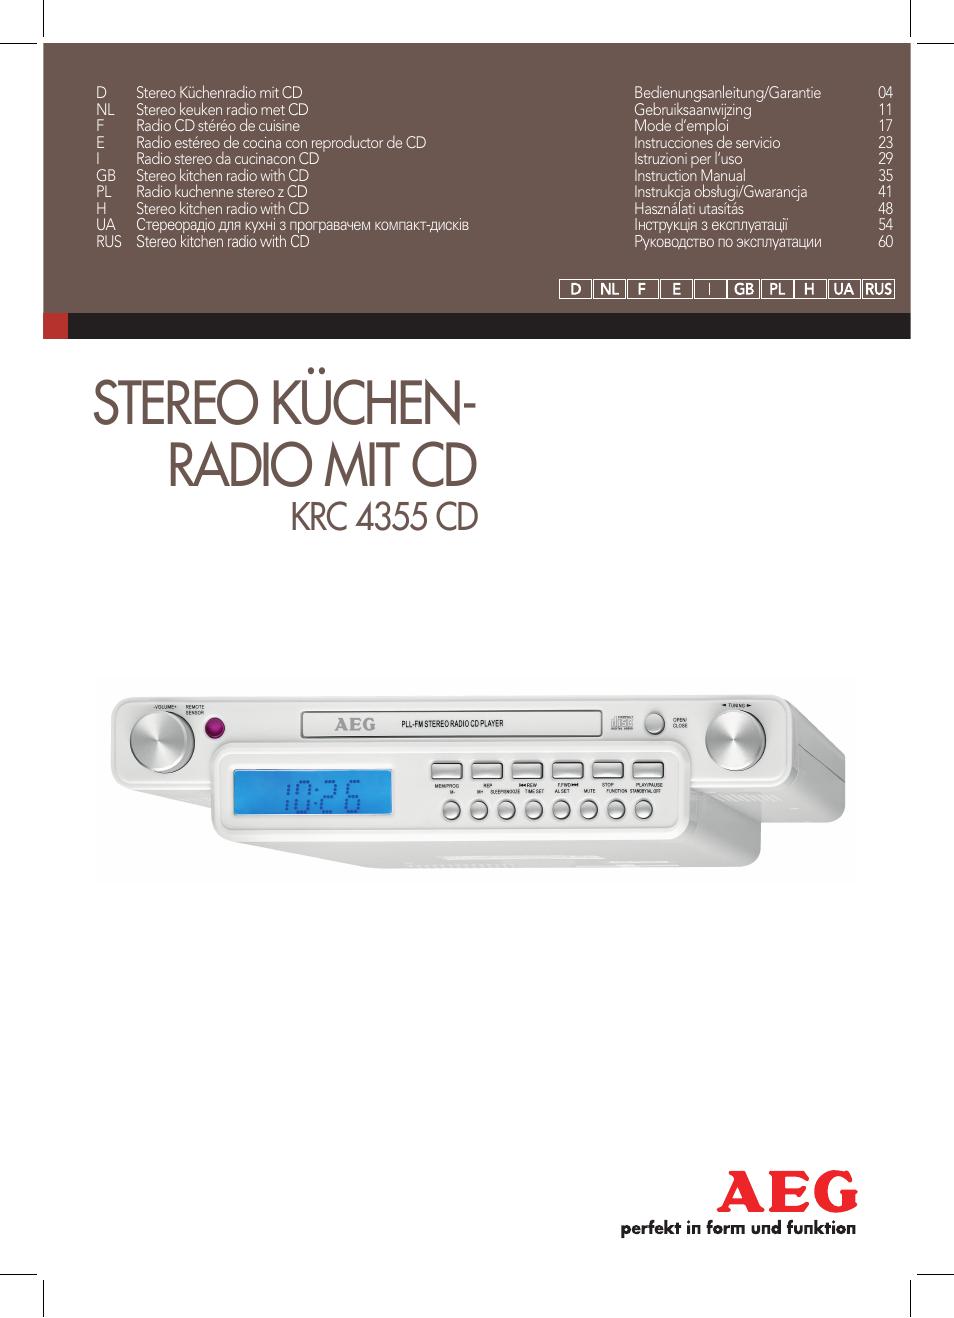 aeg krc 4355 cd user manual | 66 pages